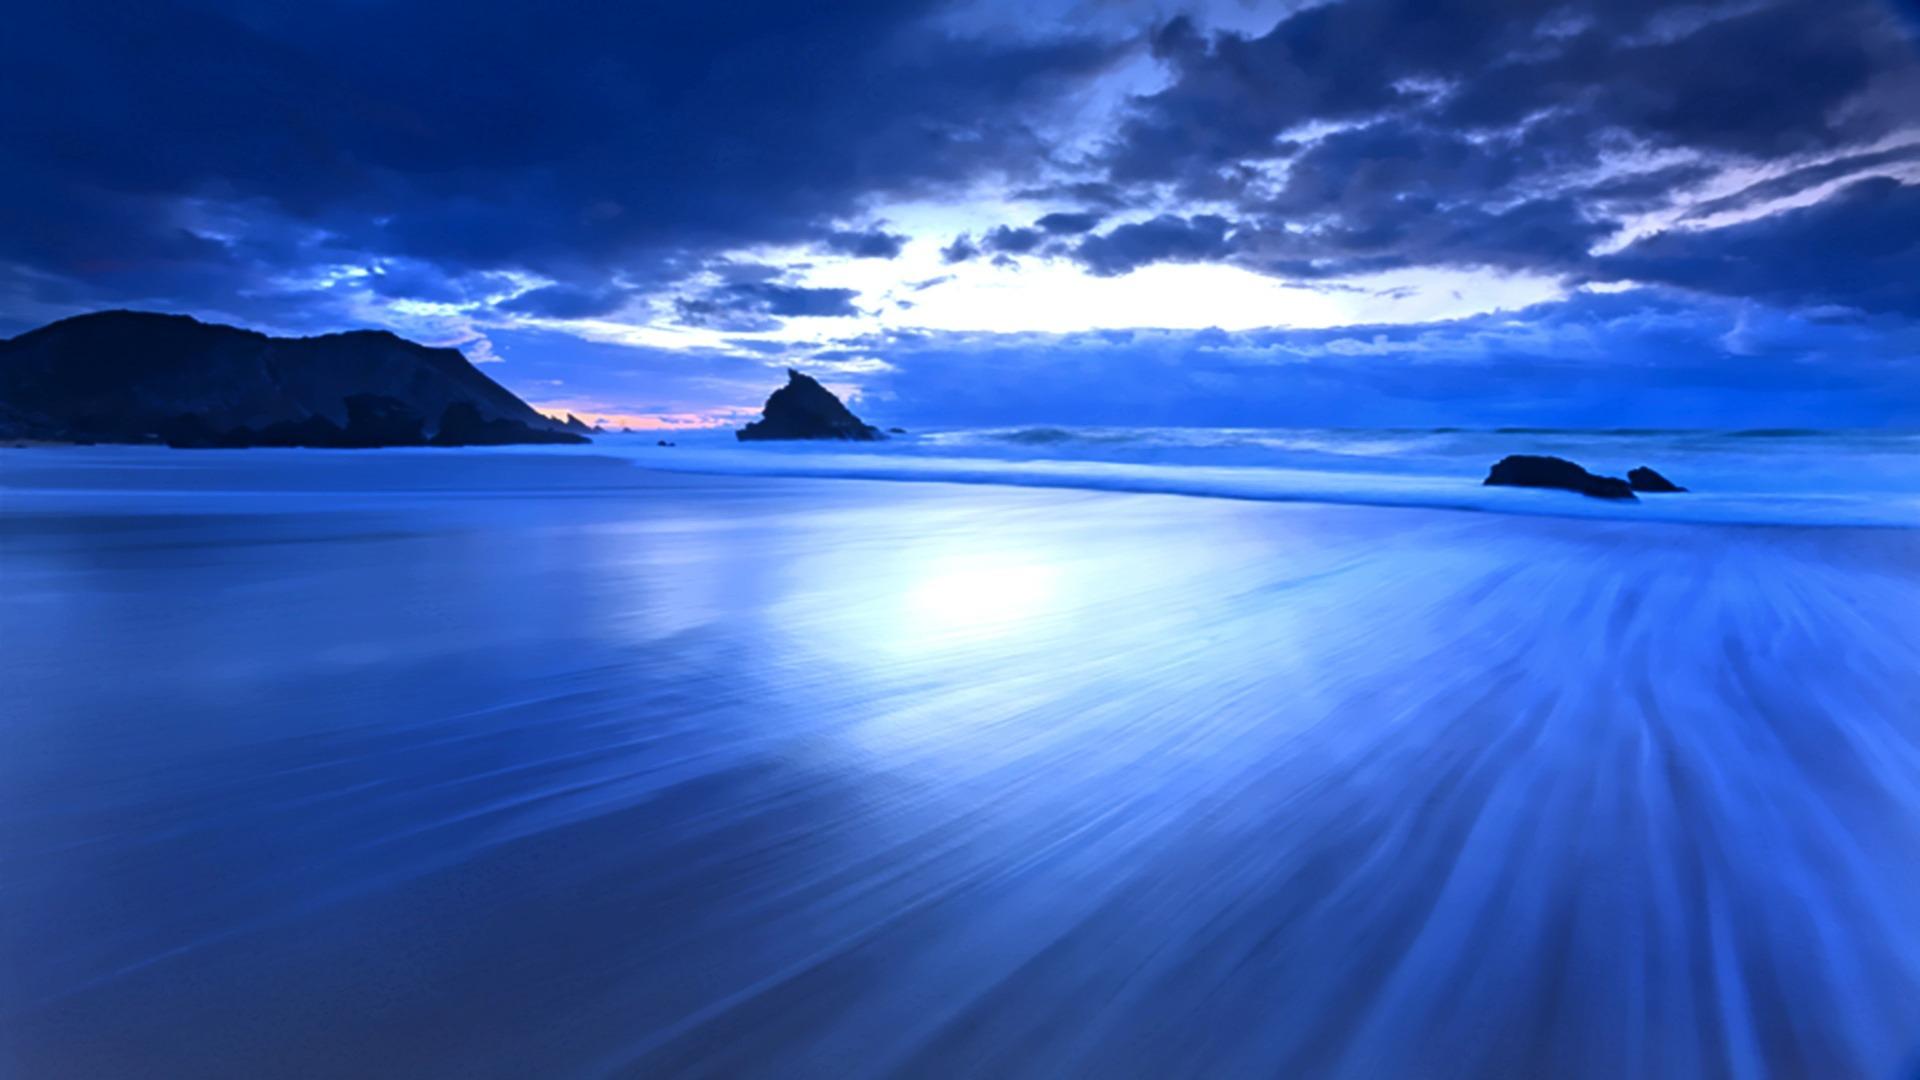 Image: https://stopcetaceancaptivitynow.files.wordpress.com/2012/09/free-ocean-desktop-wallpaper-1920x1080.jpg